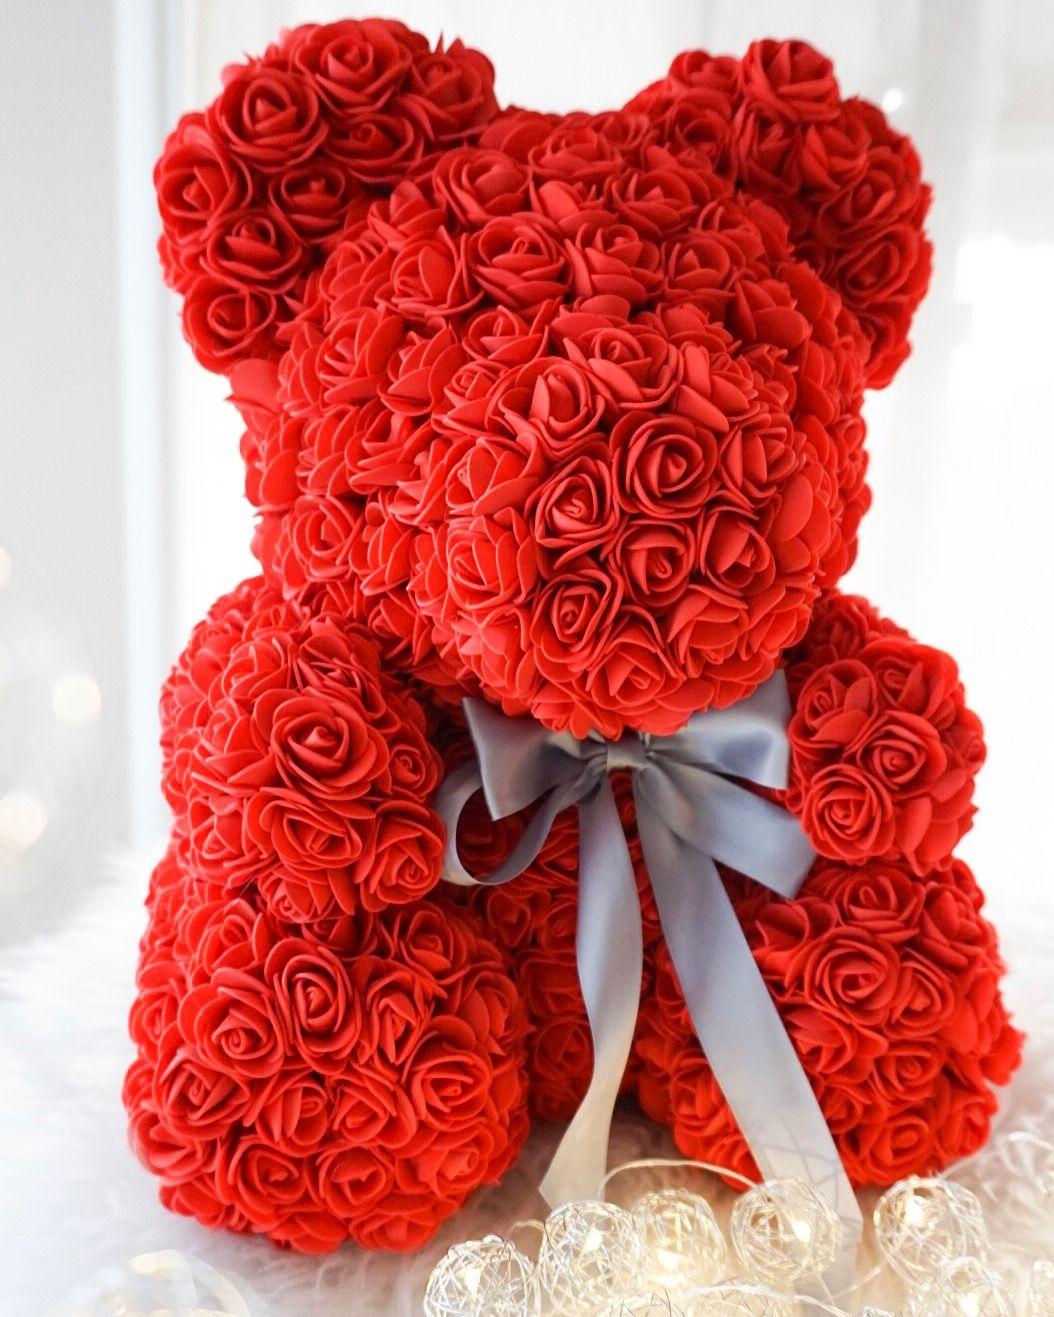 Alurdina rose bear faux rose teddy bear artificial